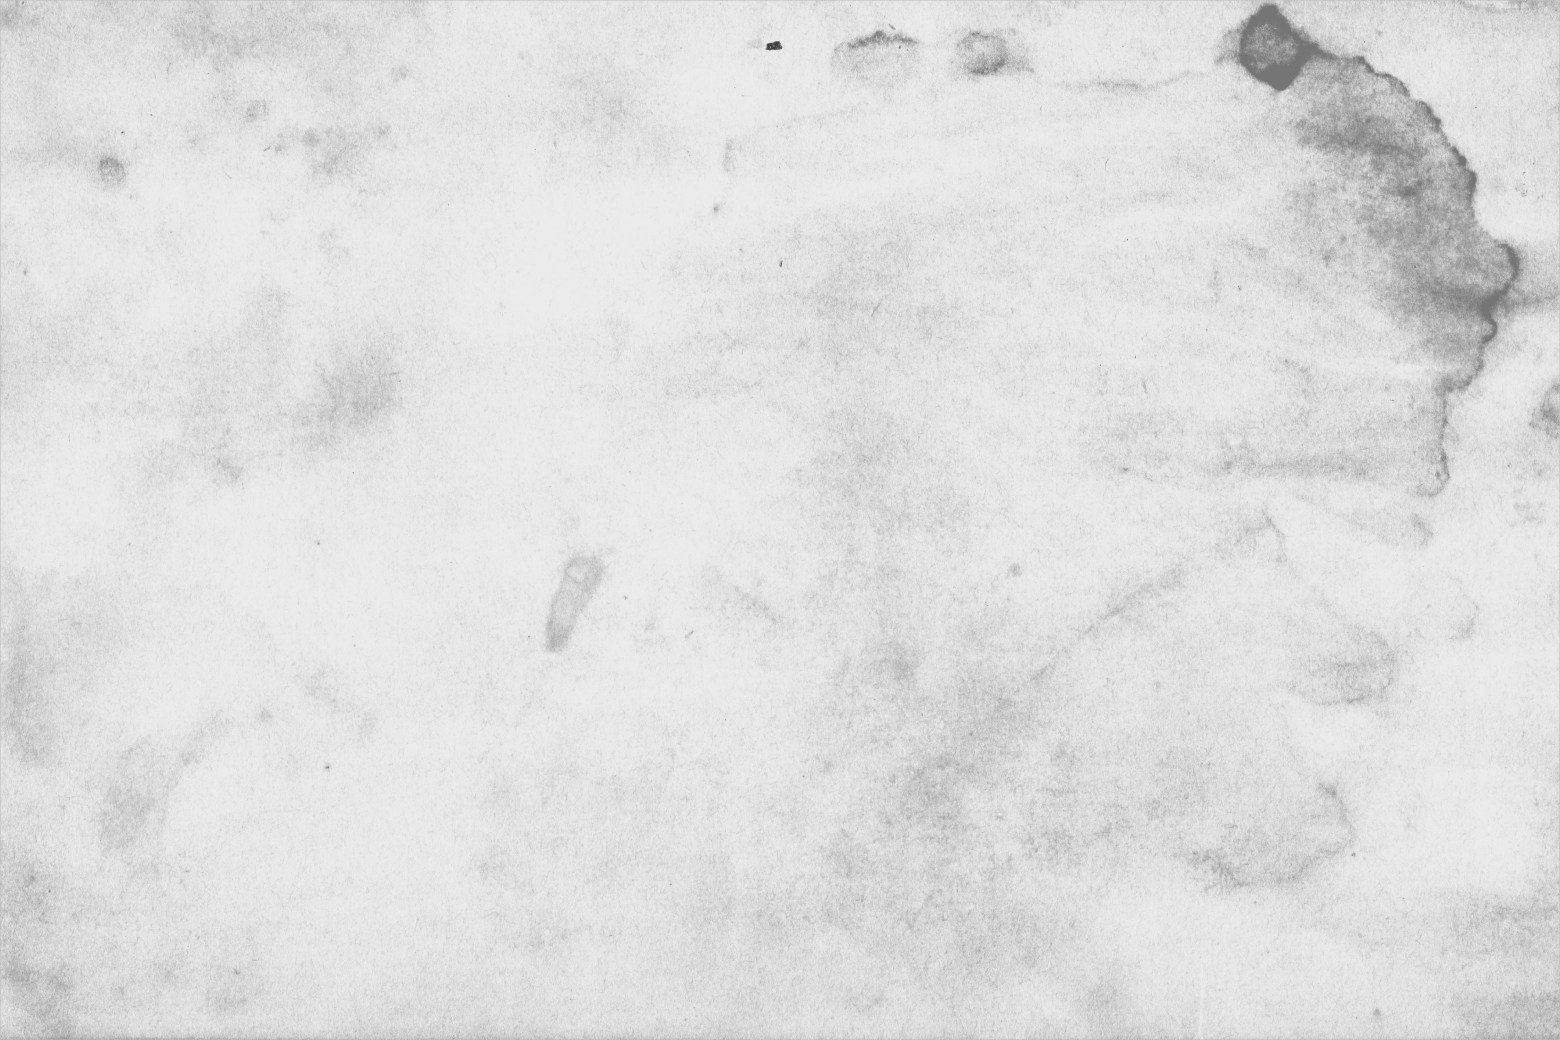 Amazing White Grunge Texture